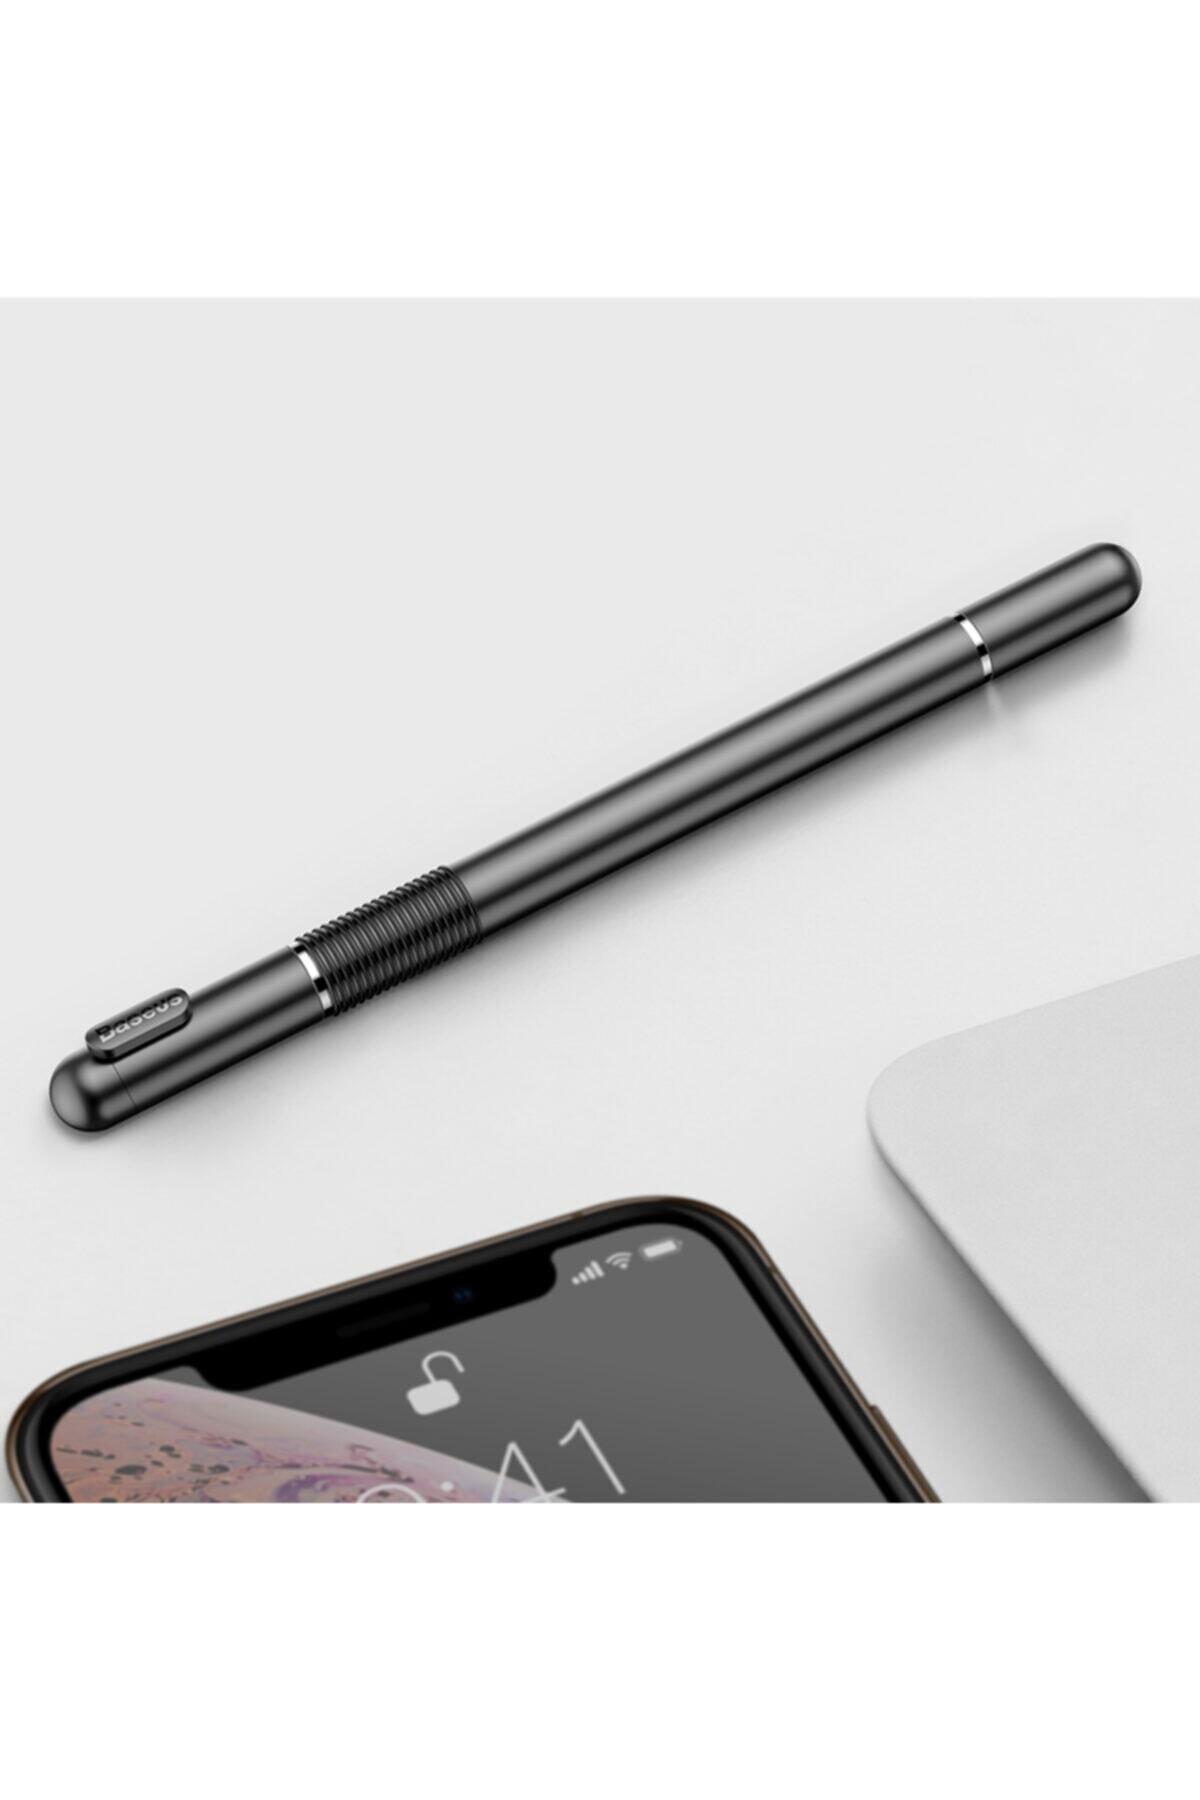 Baseus Universal Stylus Kapasif Tablet - Telefon Dokunmatik Kalem